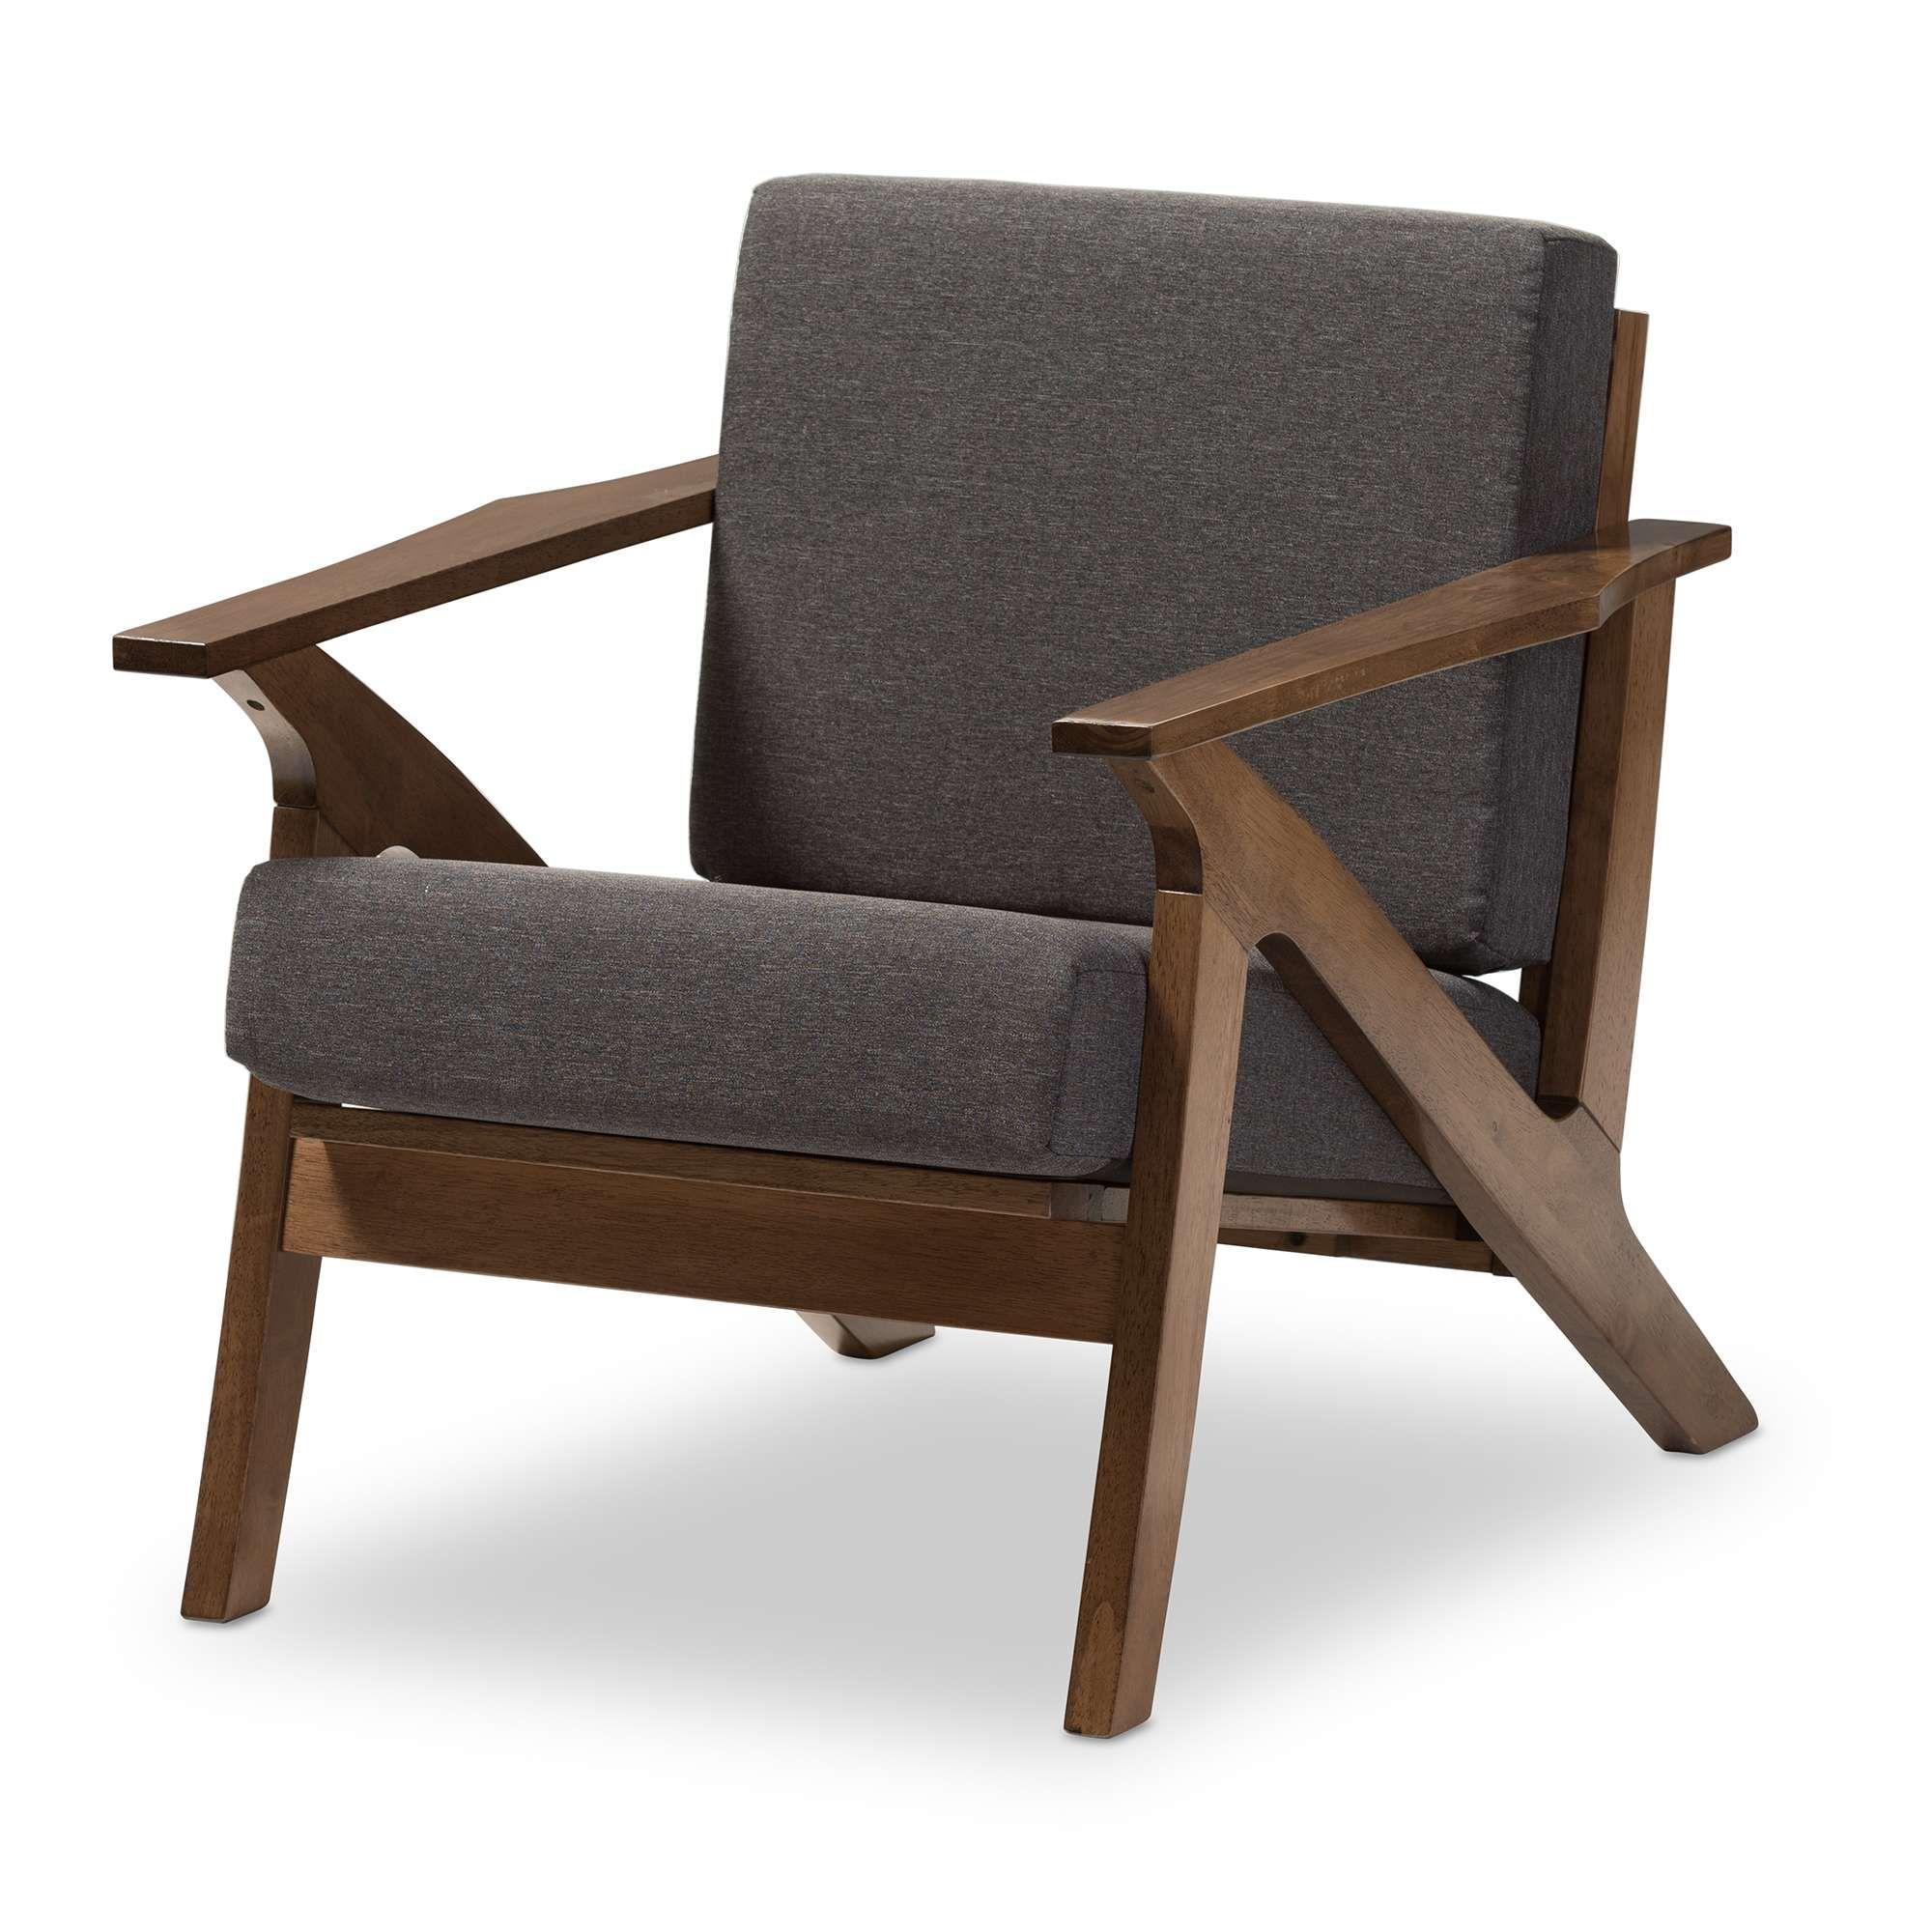 Lowest Price On Baxton Studio Cayla Mid Century Gray Fabric And Walnut Brown Wood Lounge Fabric Lounge Chair Lounge Chairs Living Room Mid Century Modern Wood